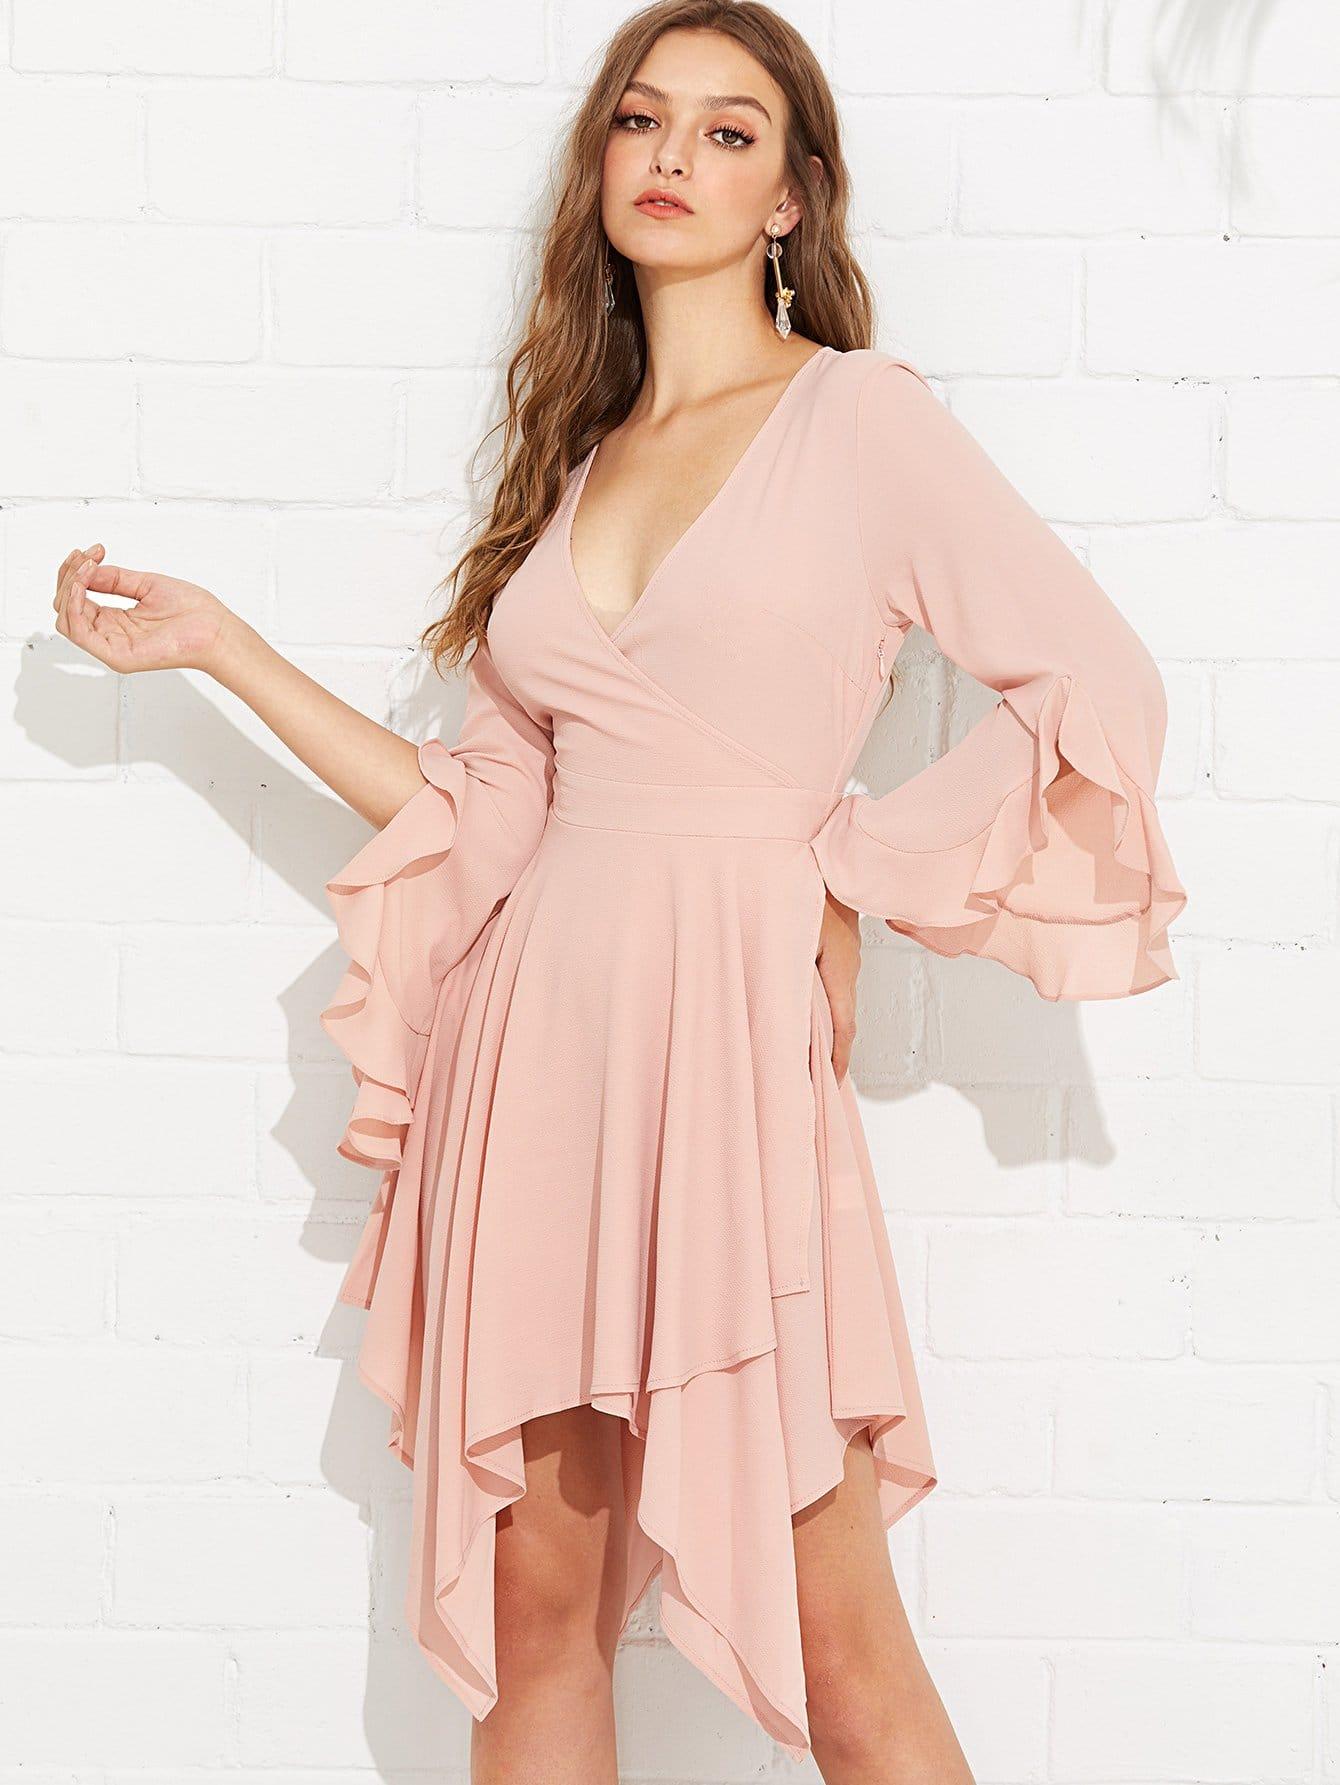 Ruffle Bell Sleeve Hanky Hem Wrap Dress ruffle bell sleeve hanky hem wrap dress